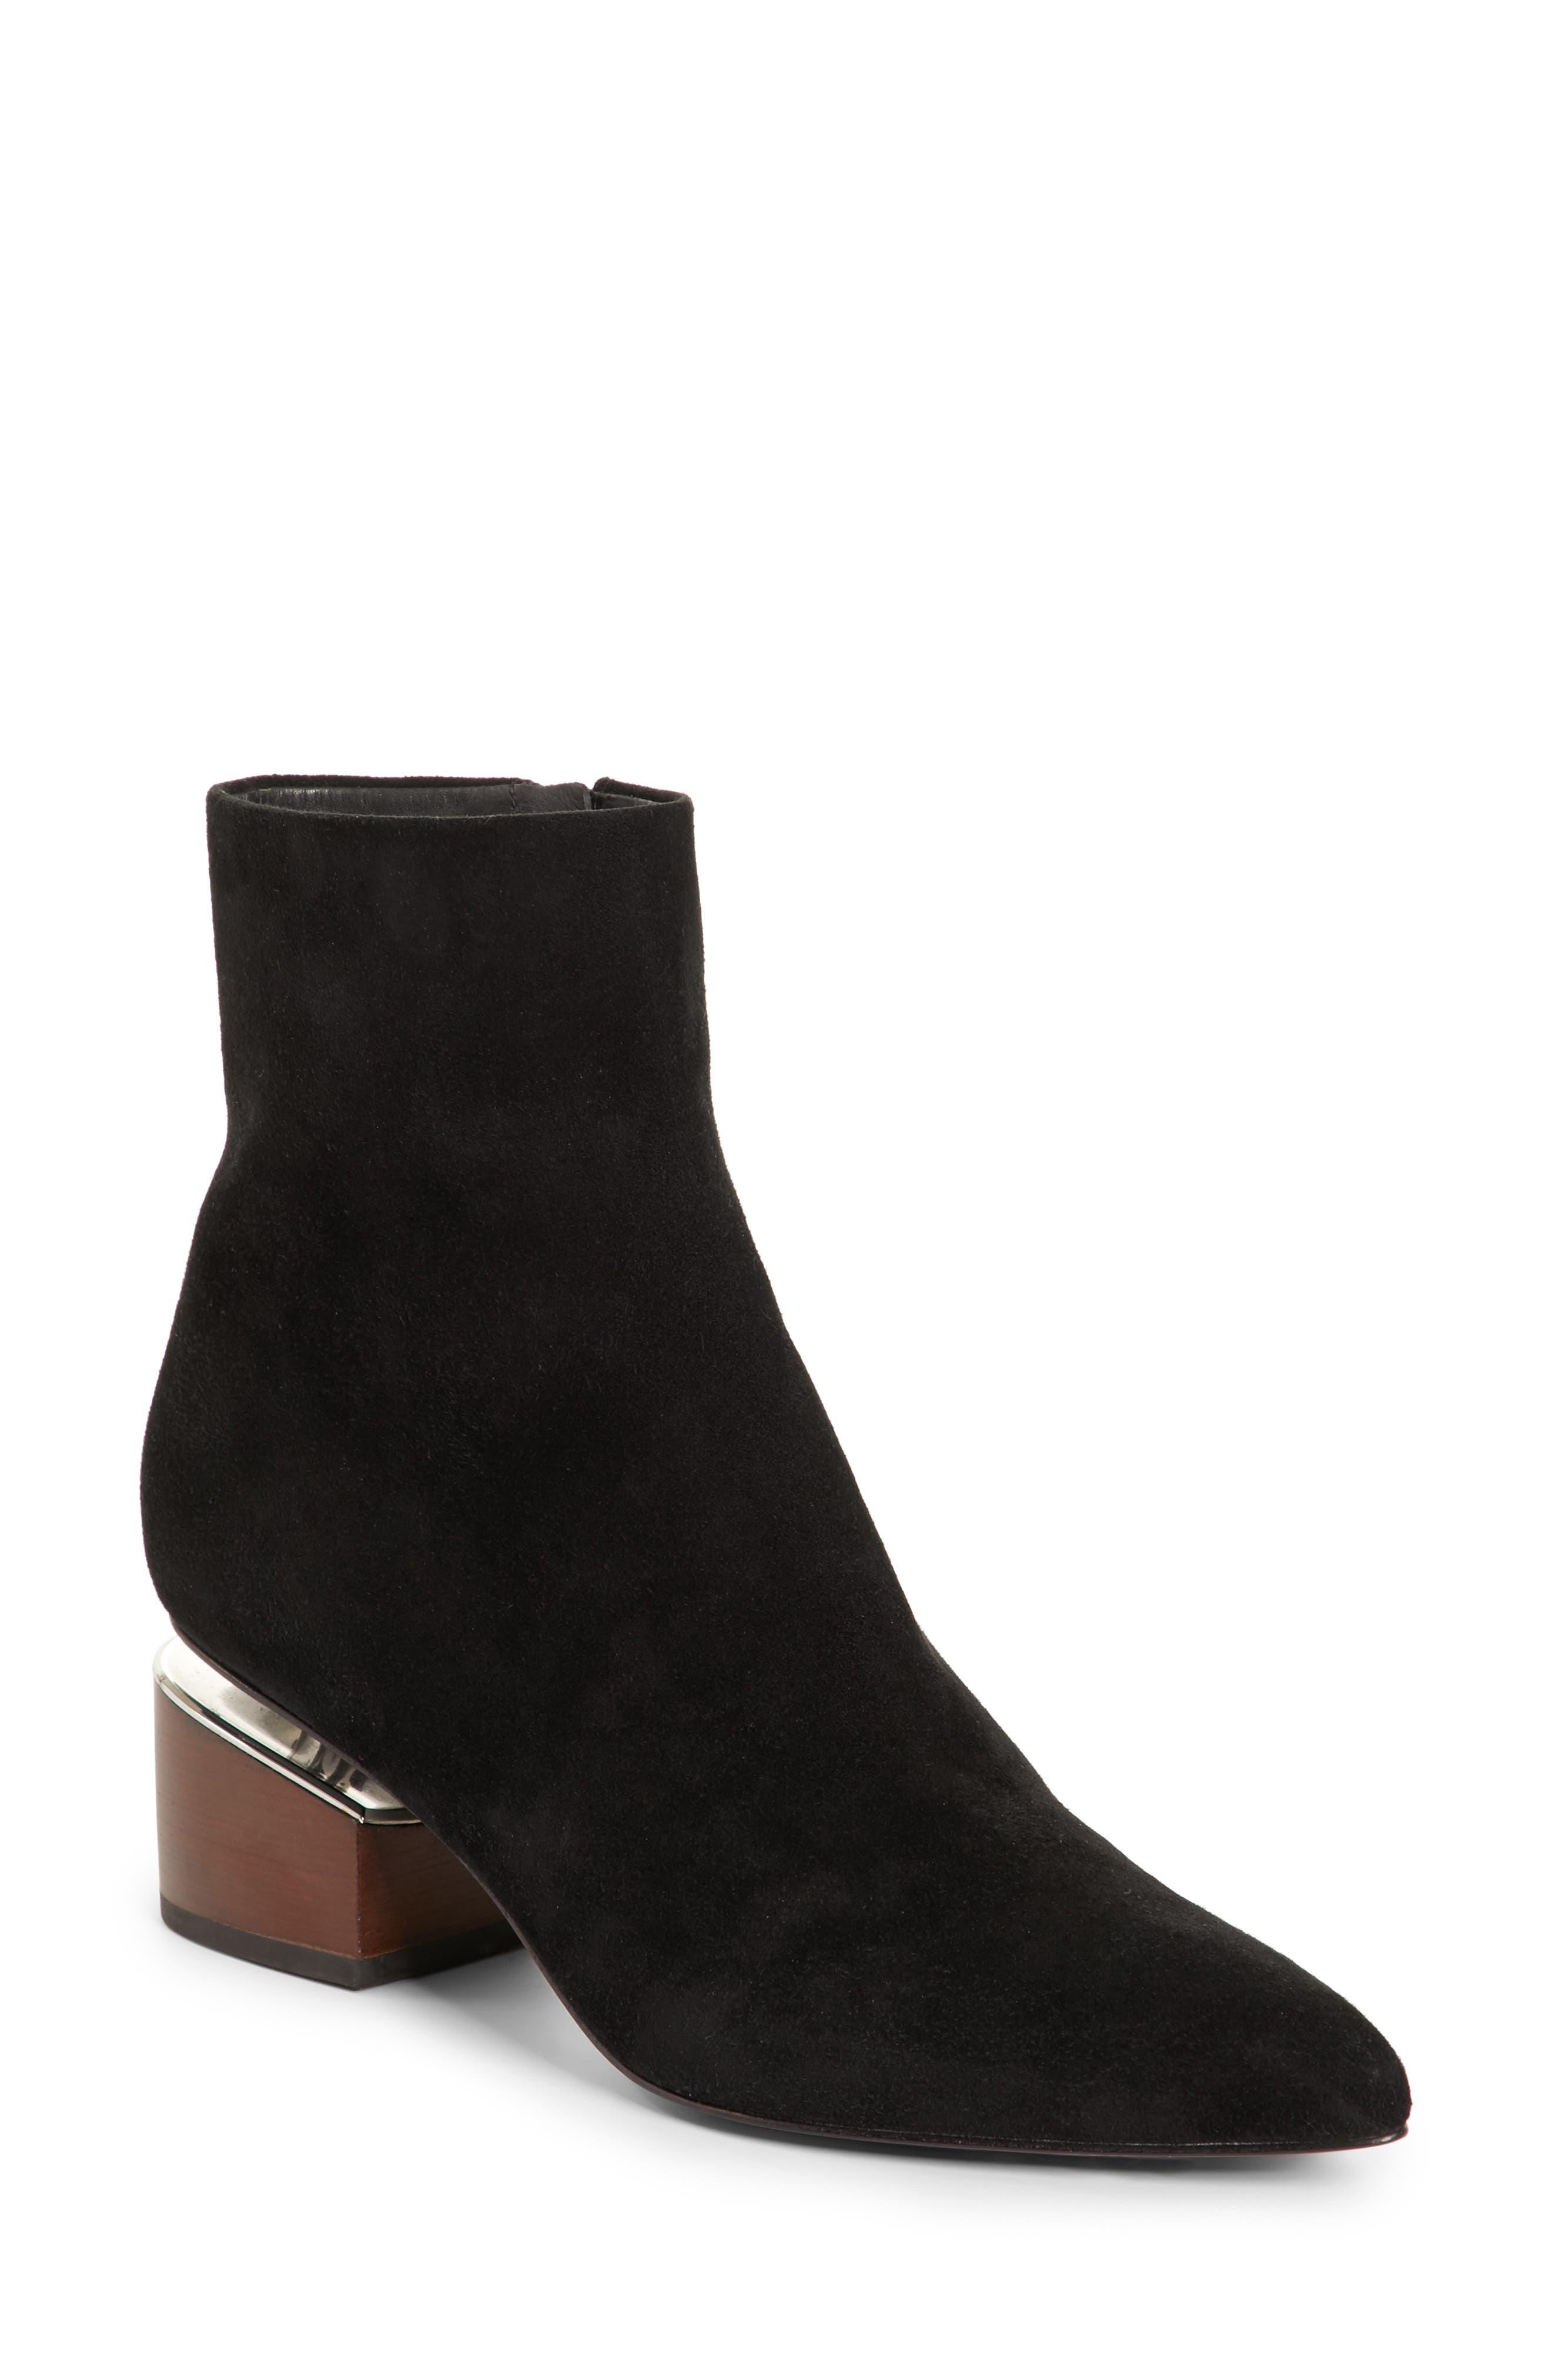 Jude Block Heel Bootie,                         Main,                         color, BLACK